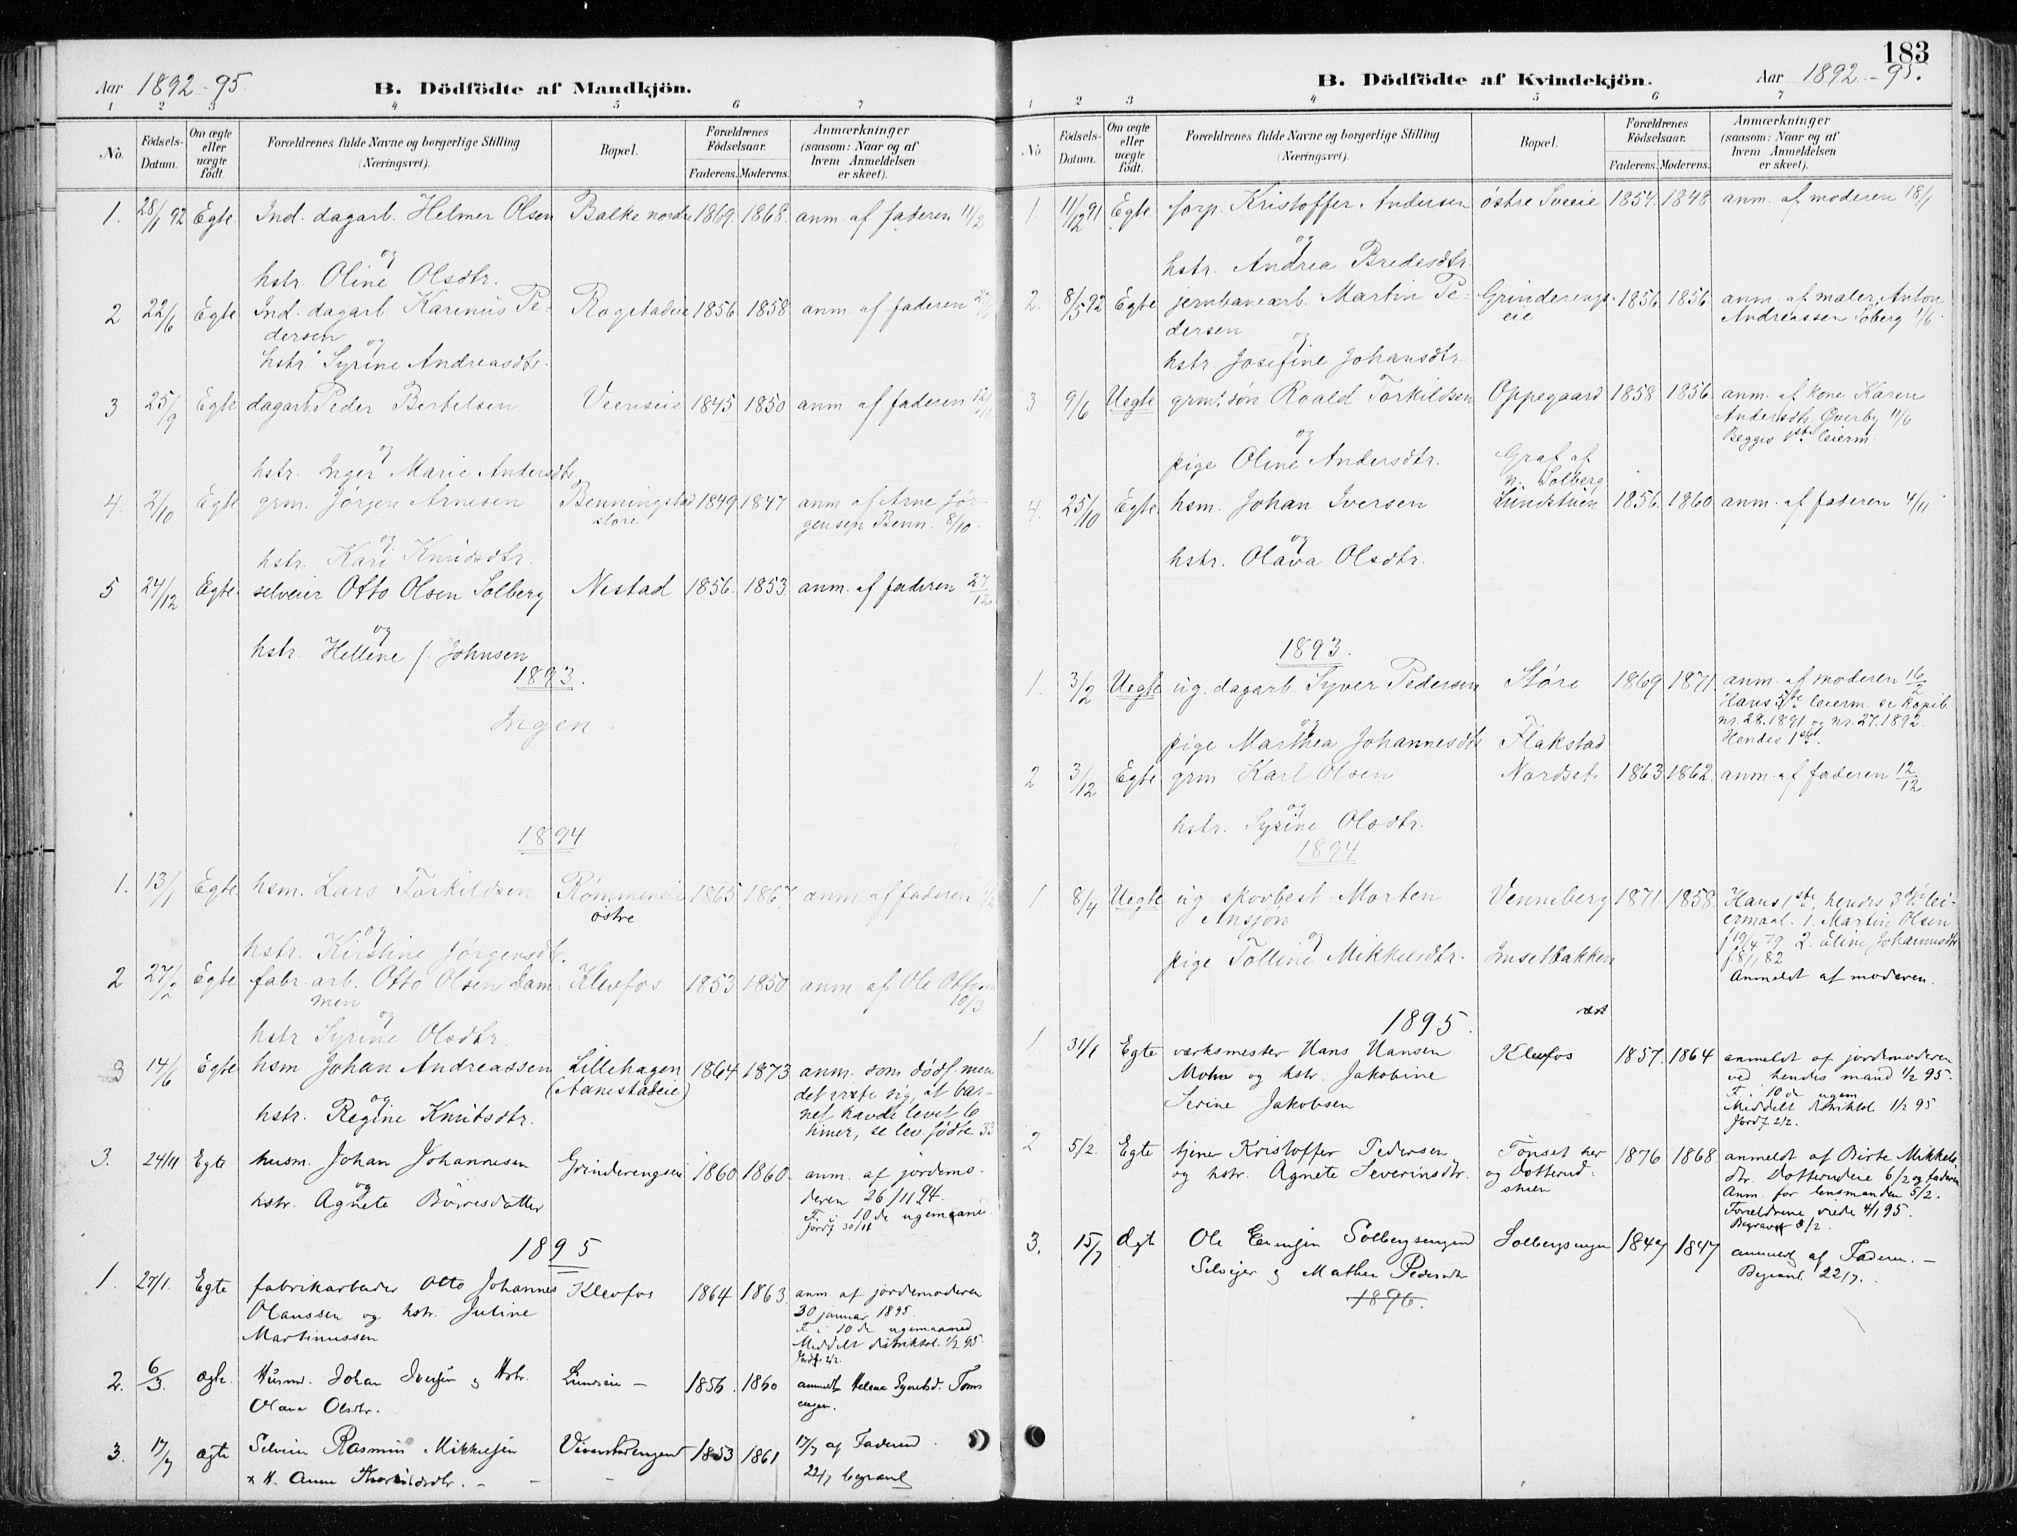 SAH, Løten prestekontor, K/Ka/L0010: Ministerialbok nr. 10, 1892-1907, s. 183